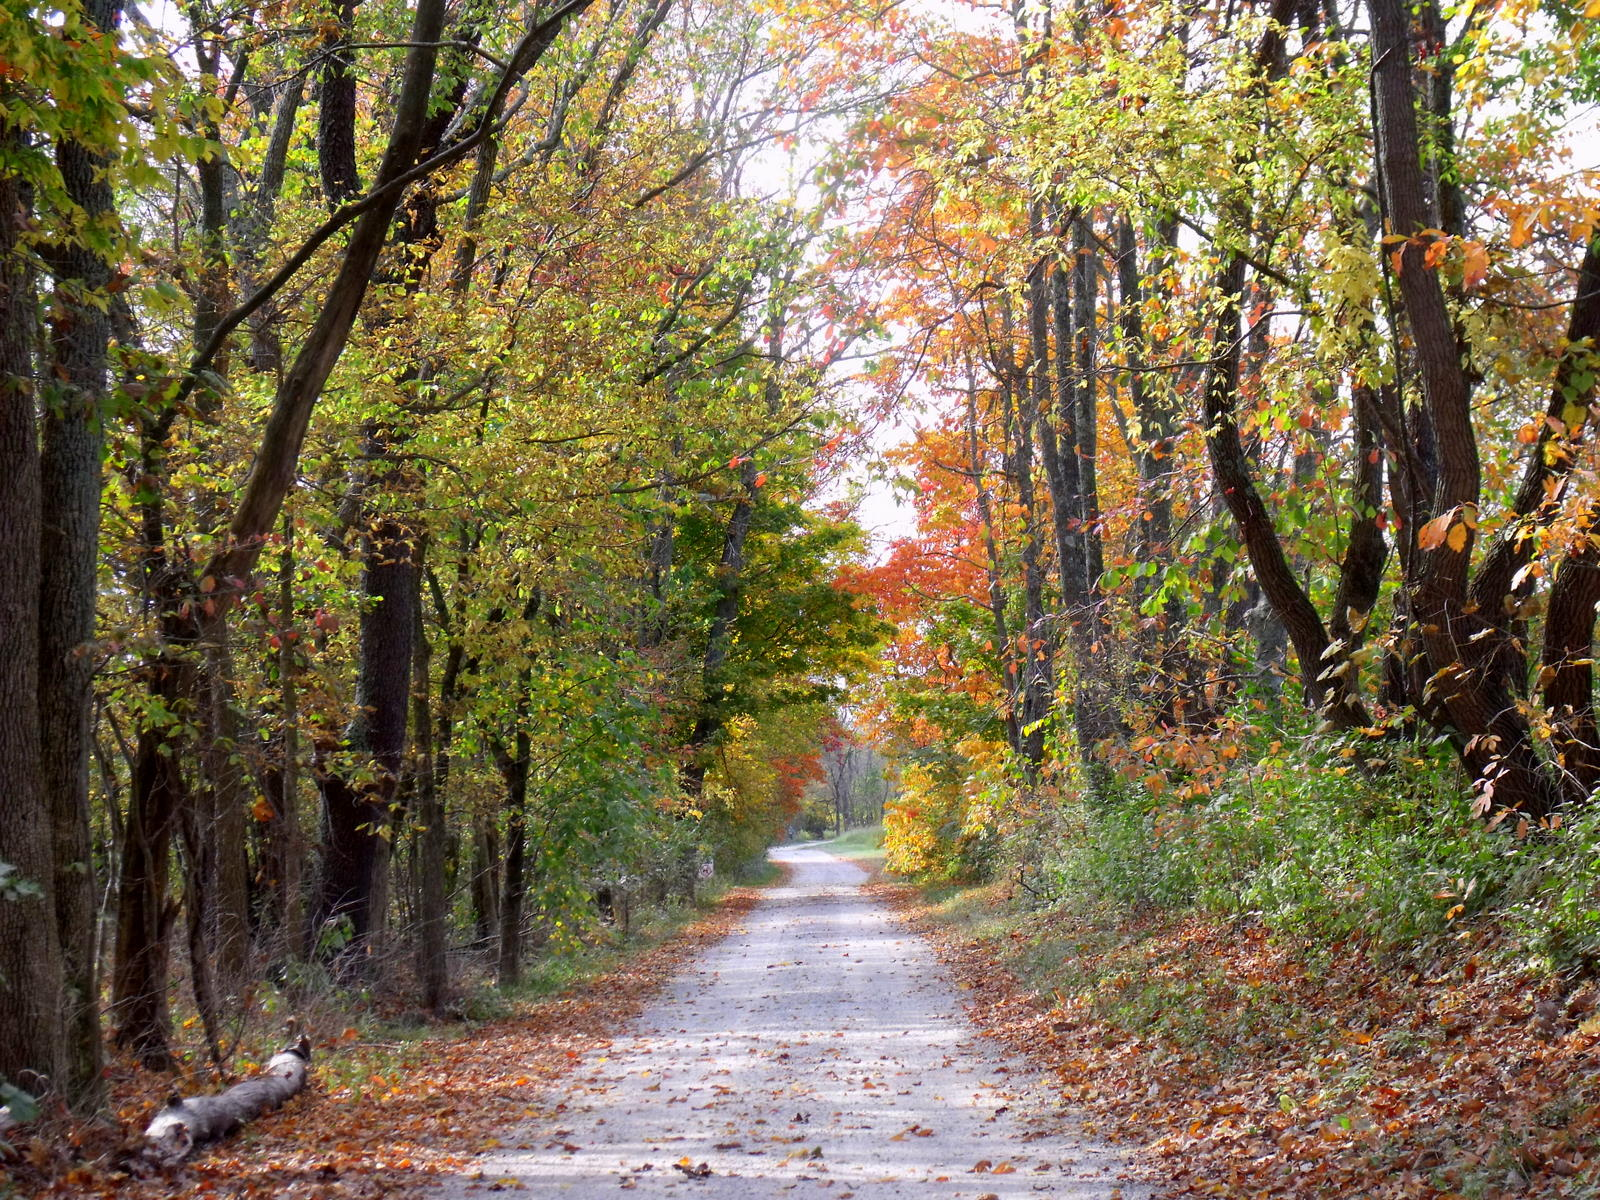 Autumn Leaves – Fall Foliage in Kentucky